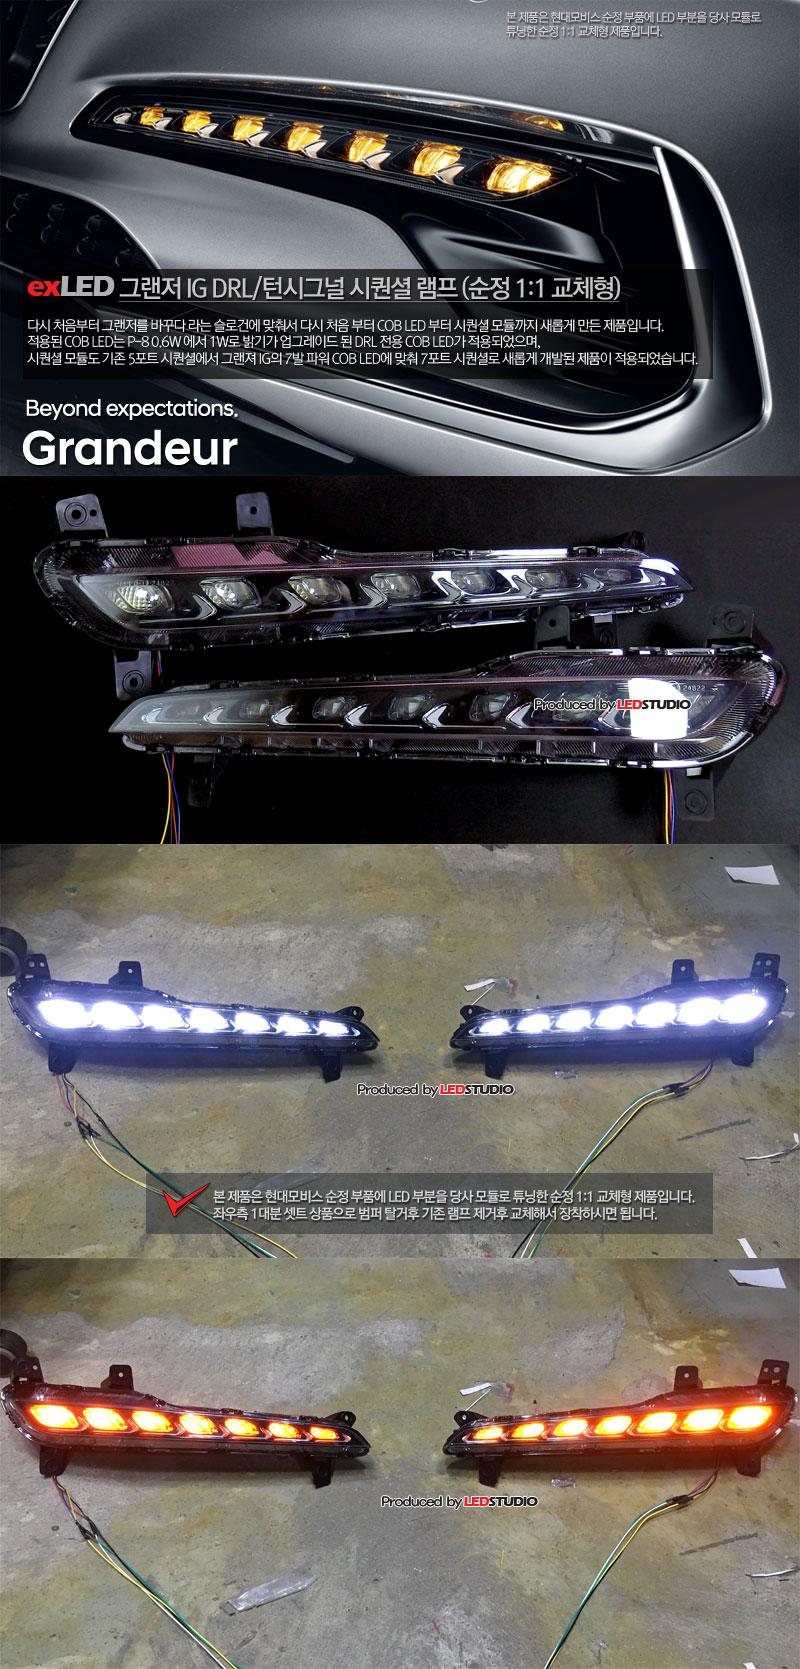 exLED 그랜저 IG용 DRL+턴 시퀀셜(무빙) 2Way  램프 (순정 1:1 교체형)